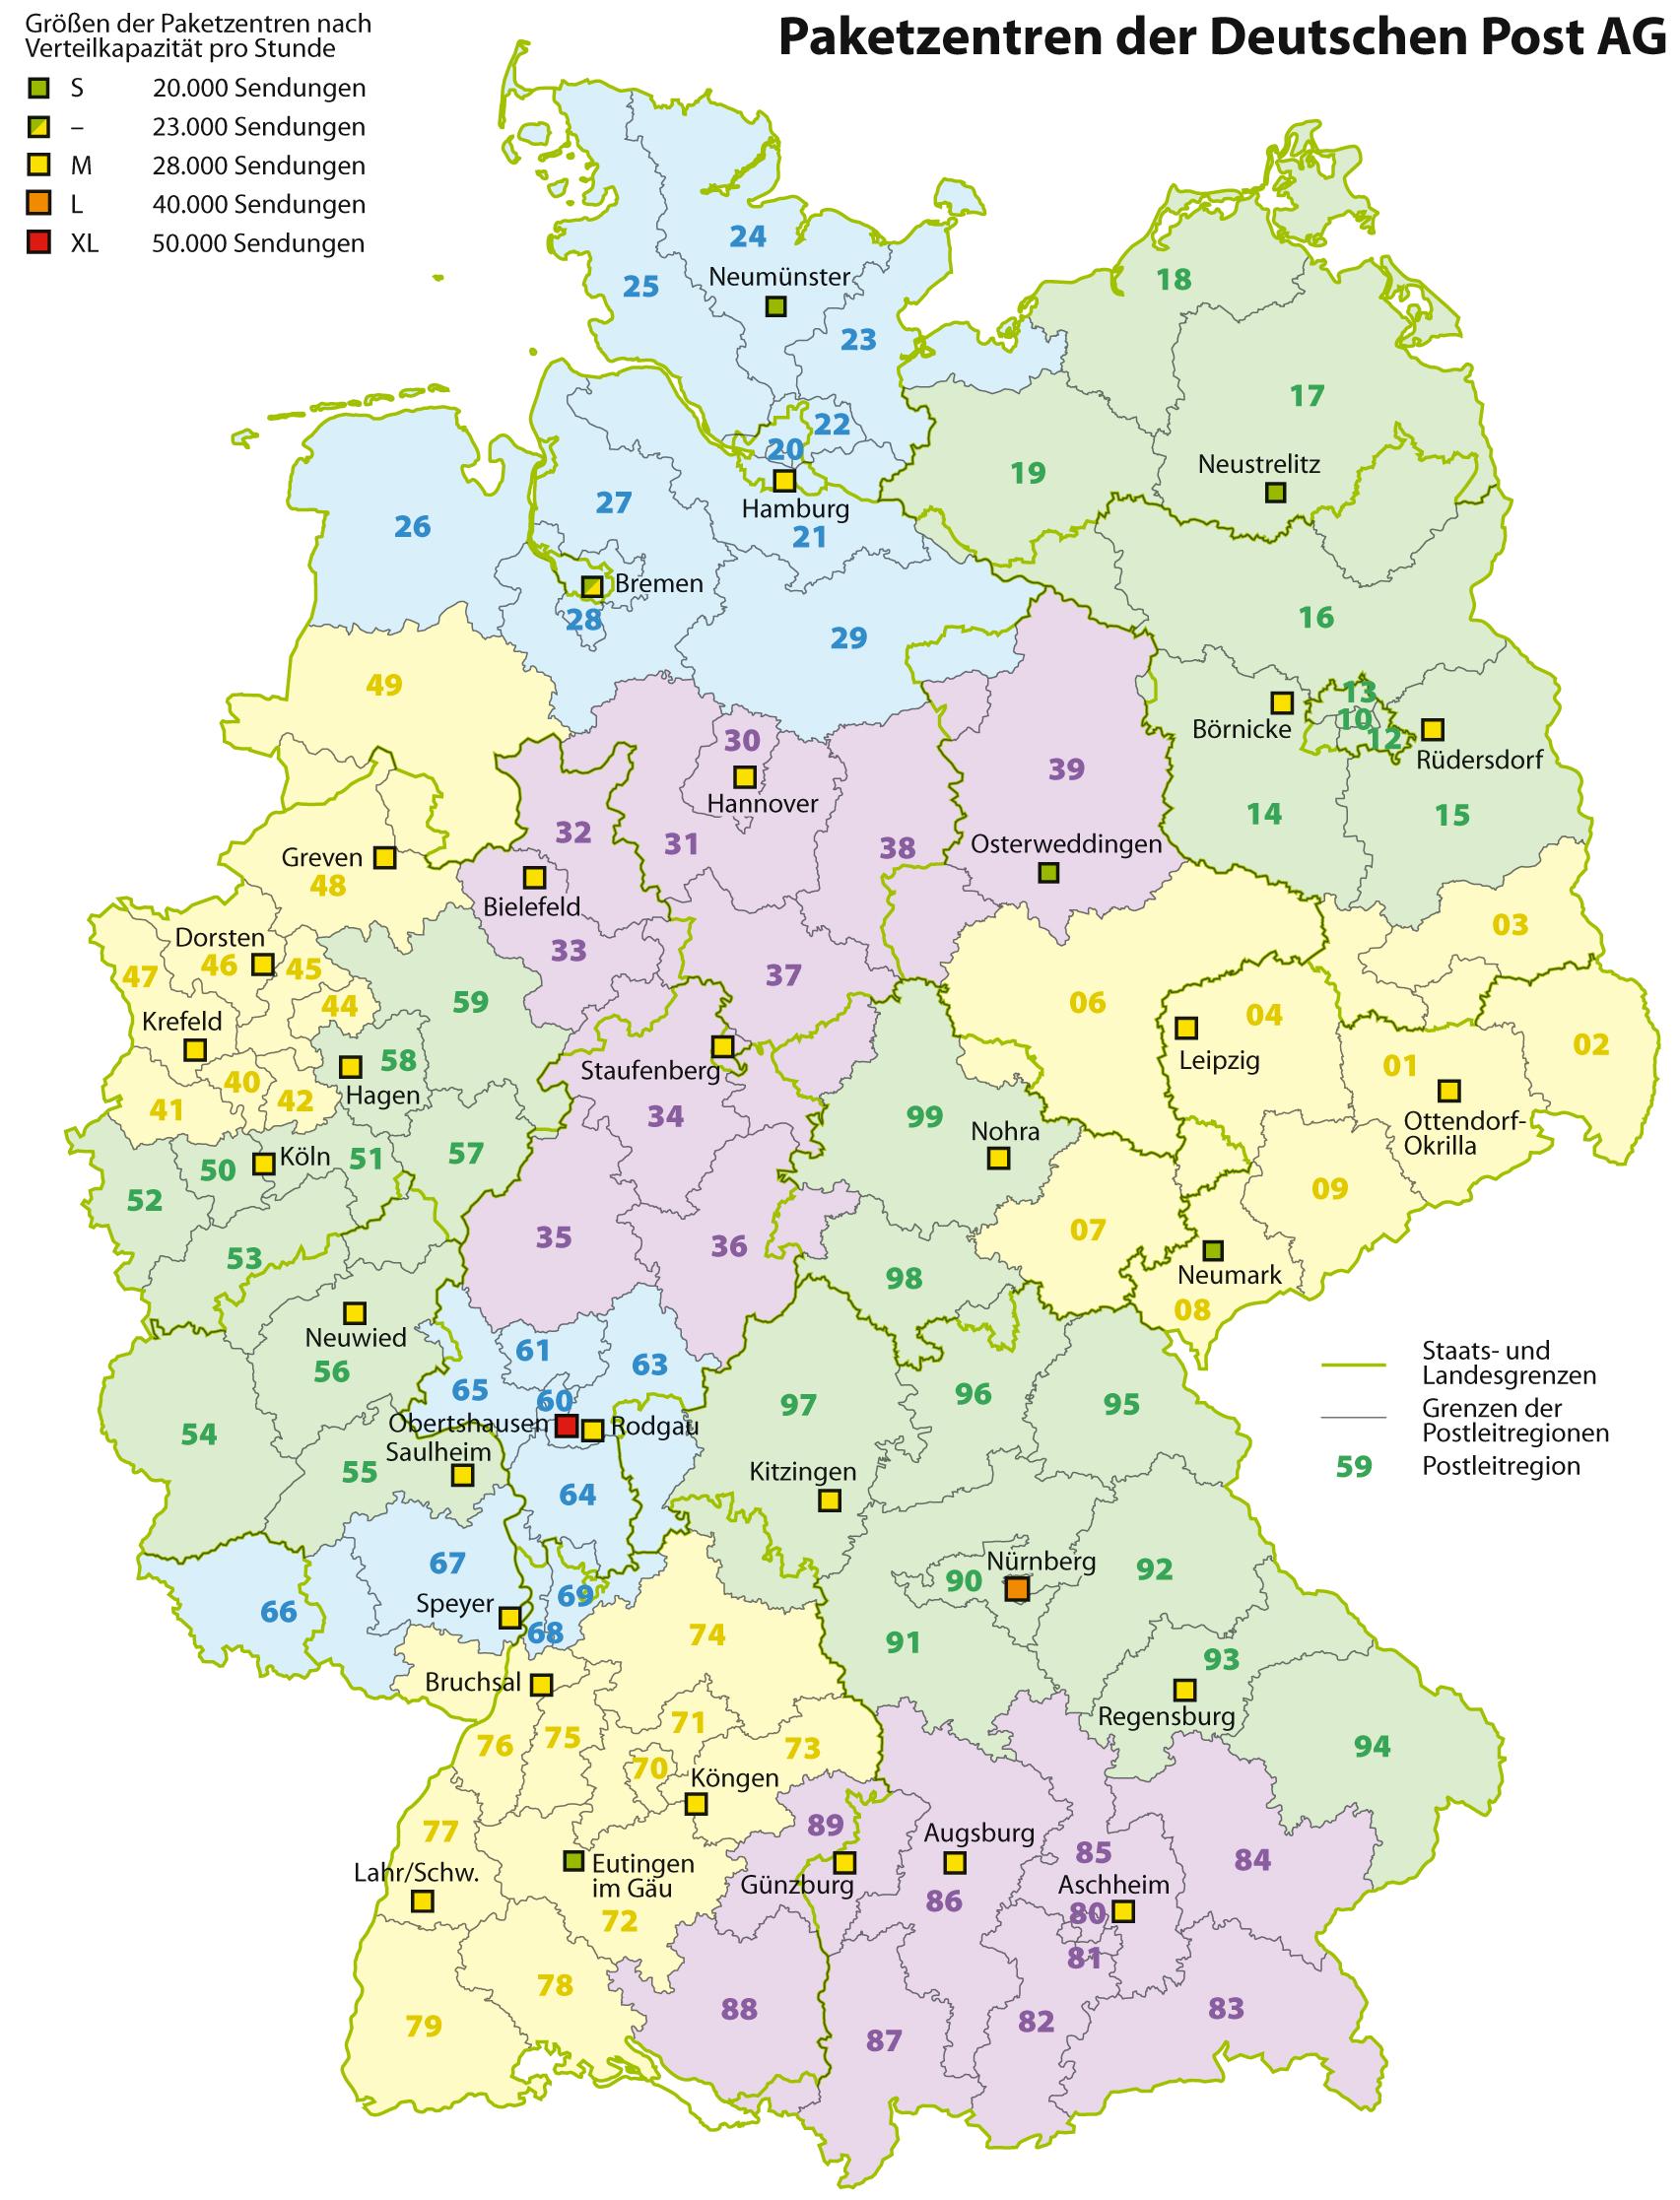 Karte Plz.Datei Karte Paketzentren Deutsche Post Ag Png Wikipedia